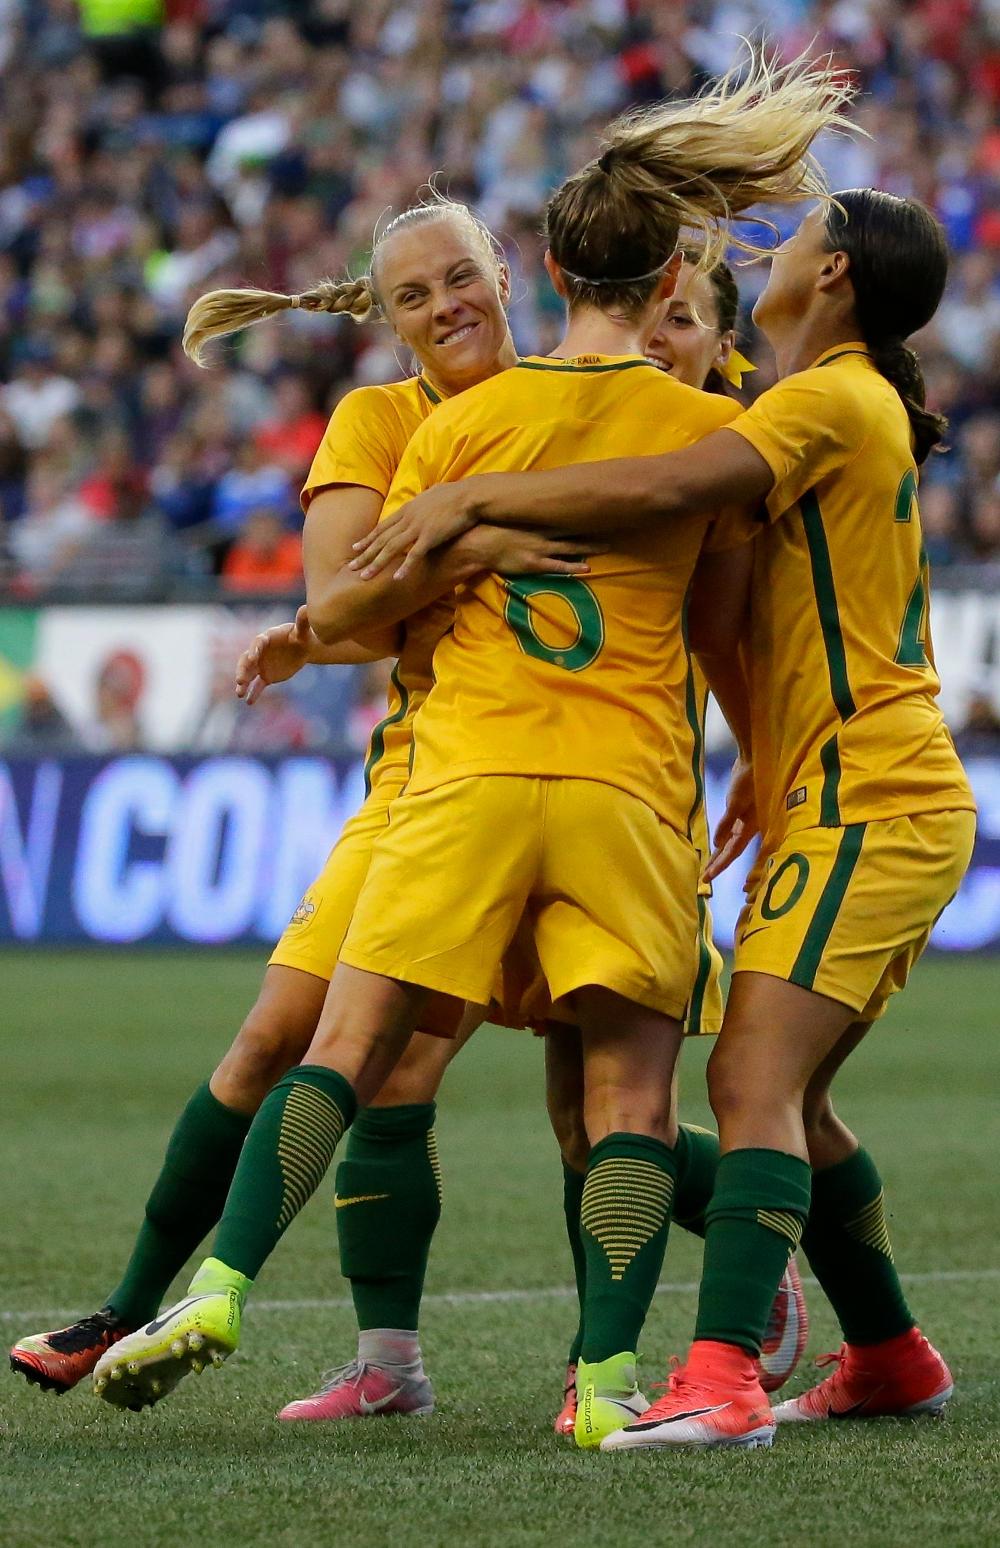 Tameka Butt Matildas Australia Football 2017 tall